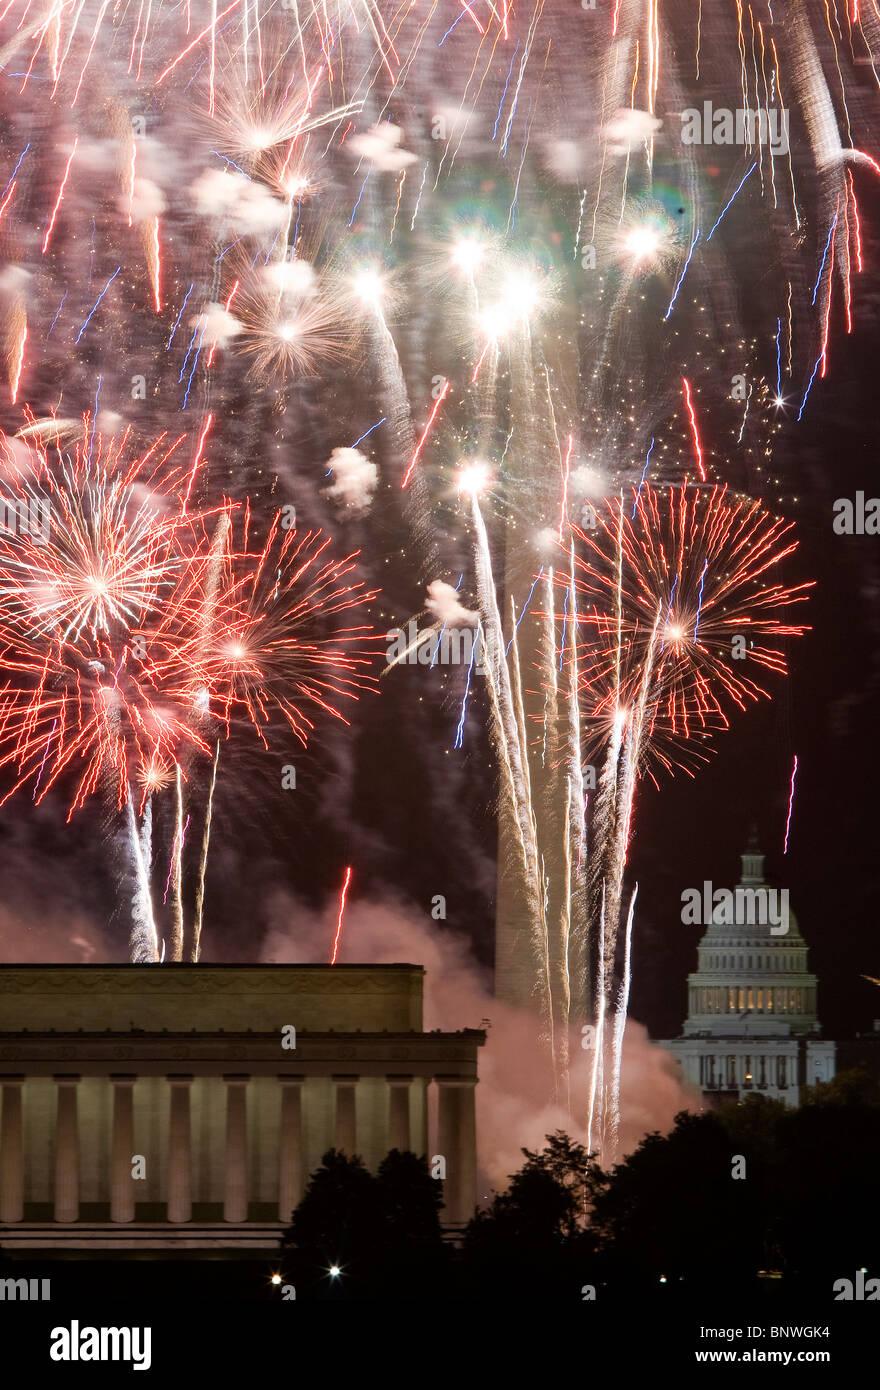 Fourth of July fireworks in Washington, DC.  Stock Photo